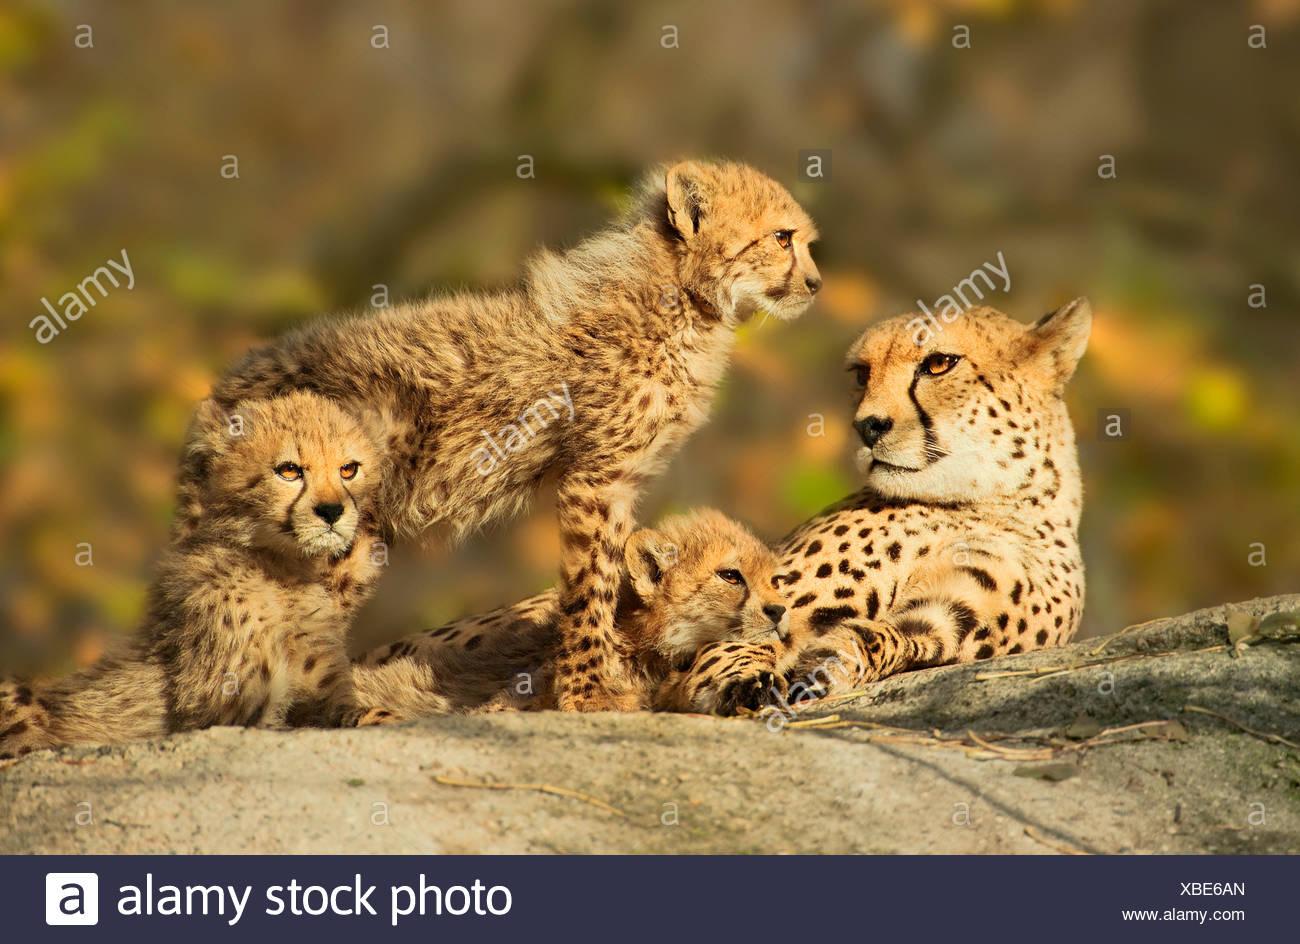 cheetah family 1 - Stock Image